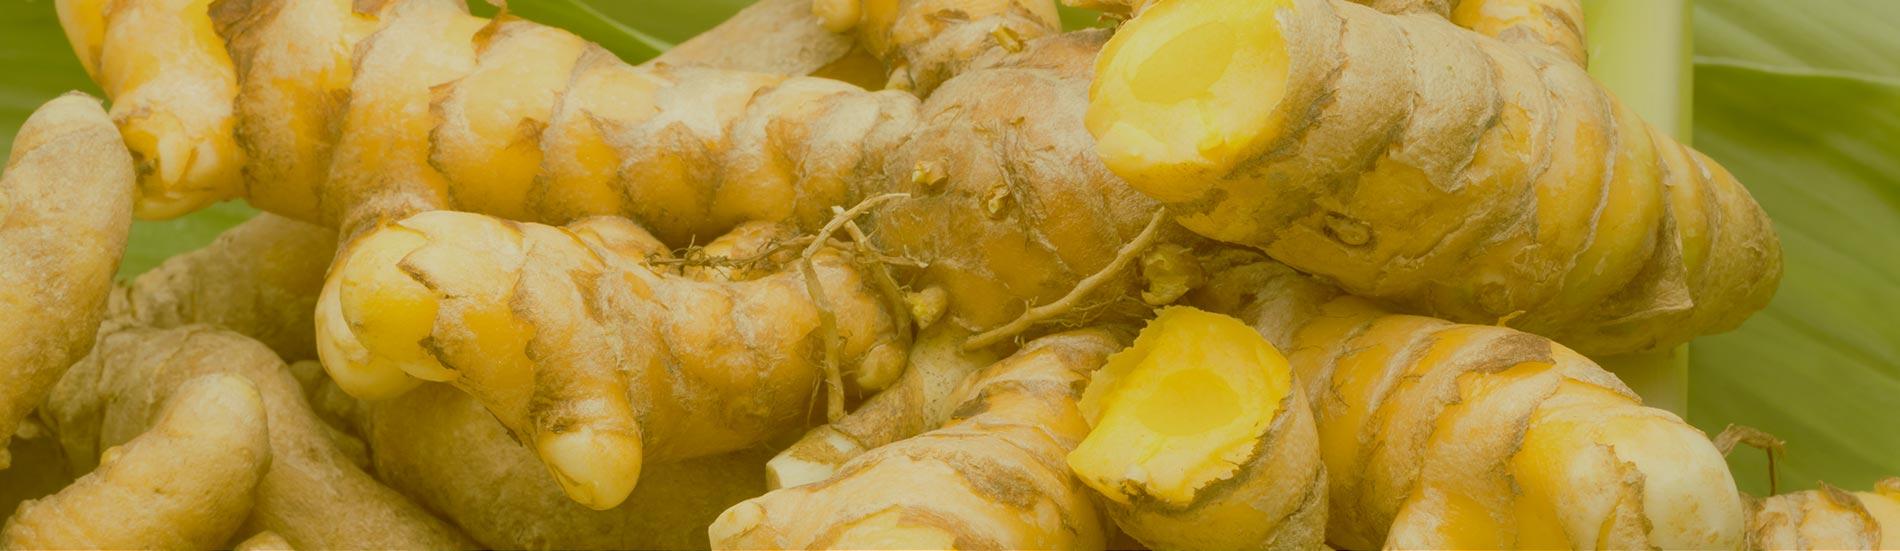 Turmeric Pineapple Coconut Kombucha